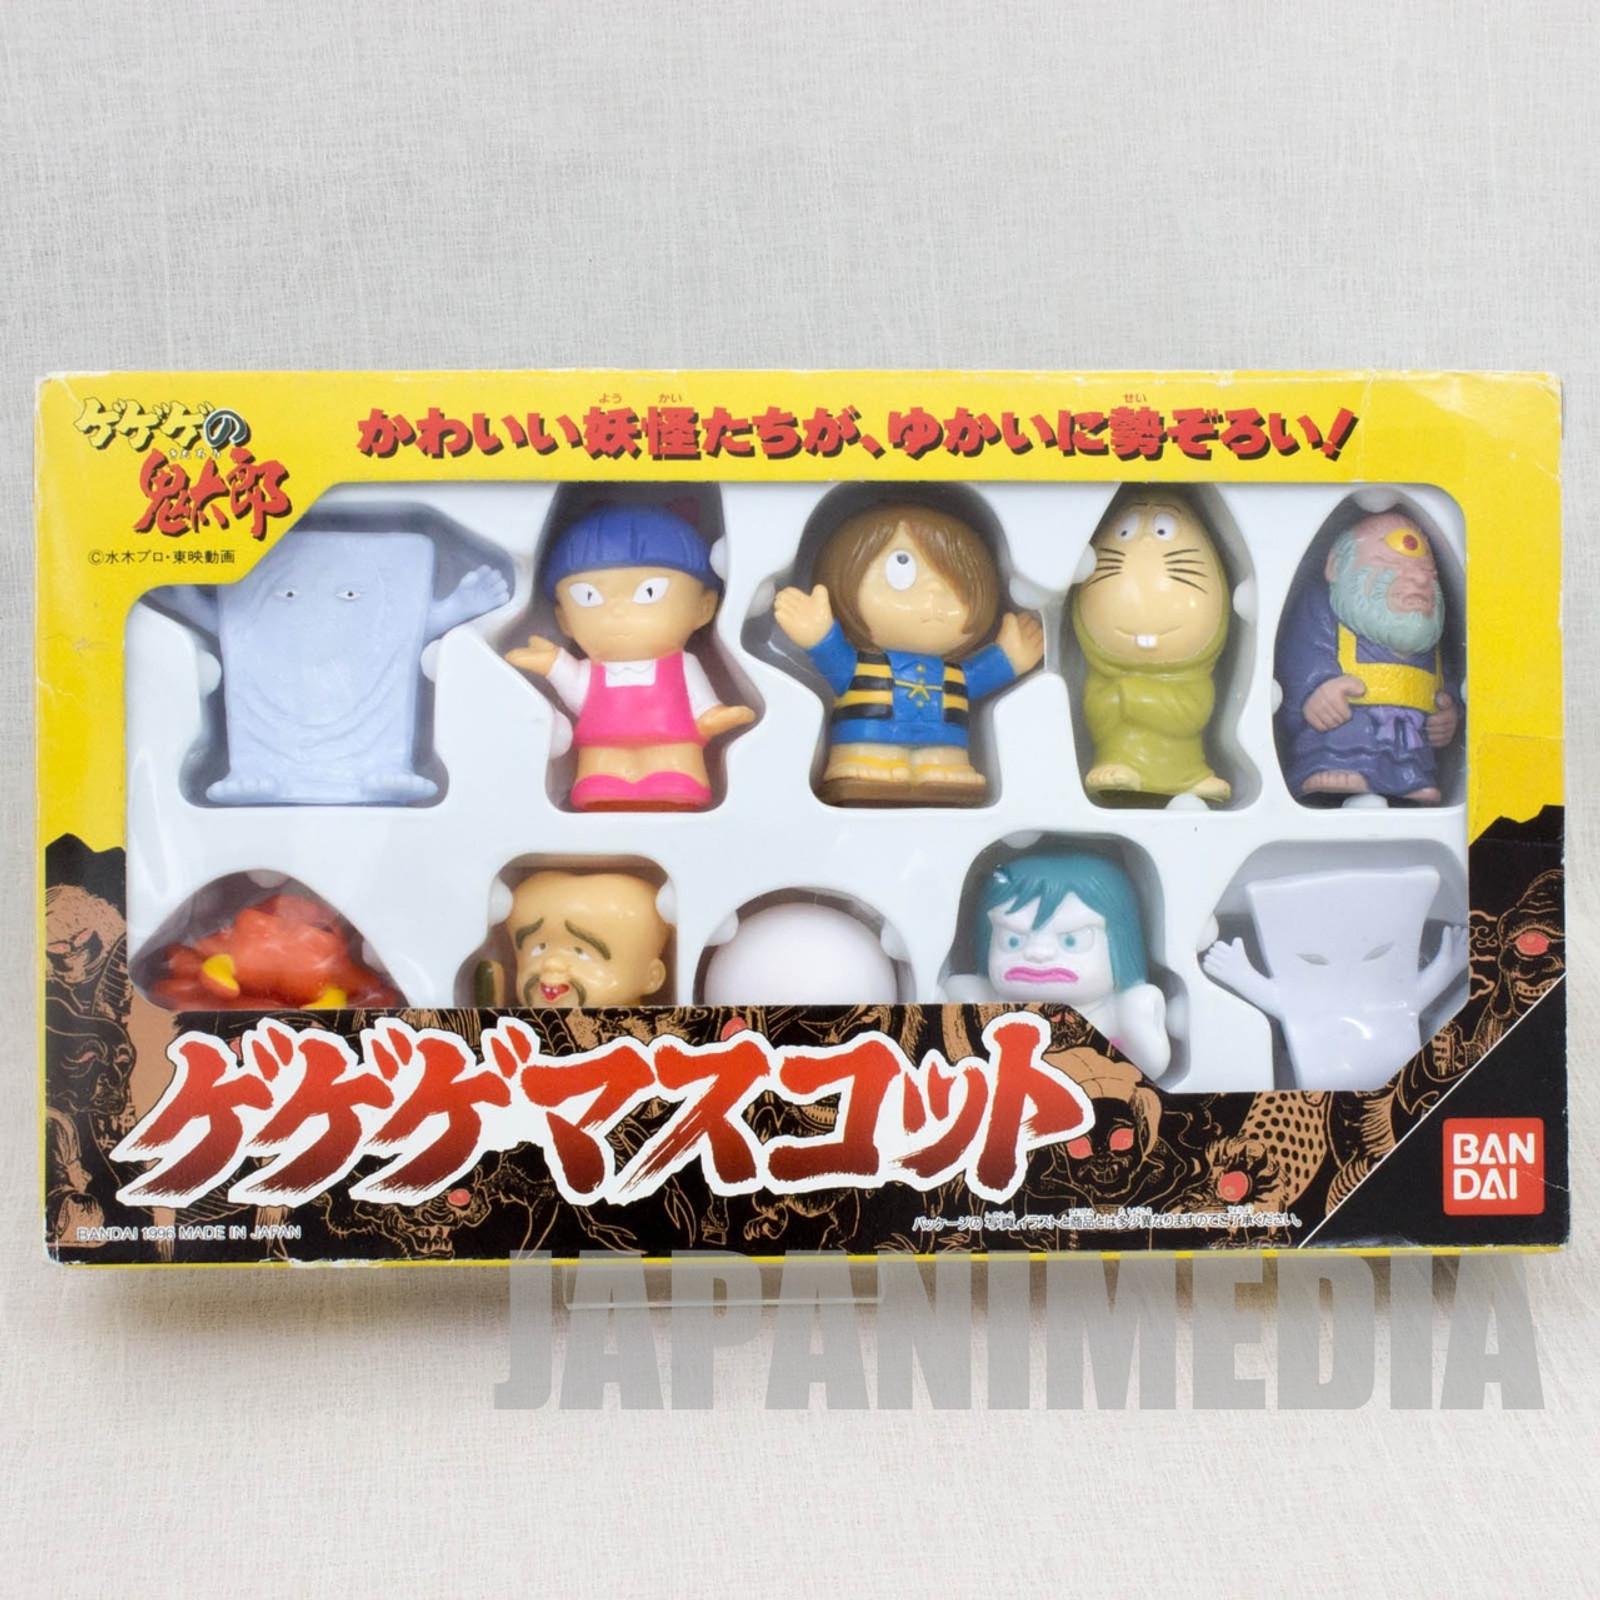 Gegege no Kitaro Soft Vinyl Mascot Figure 10pc Set BANDAI JAPAN ANIME YOKAI